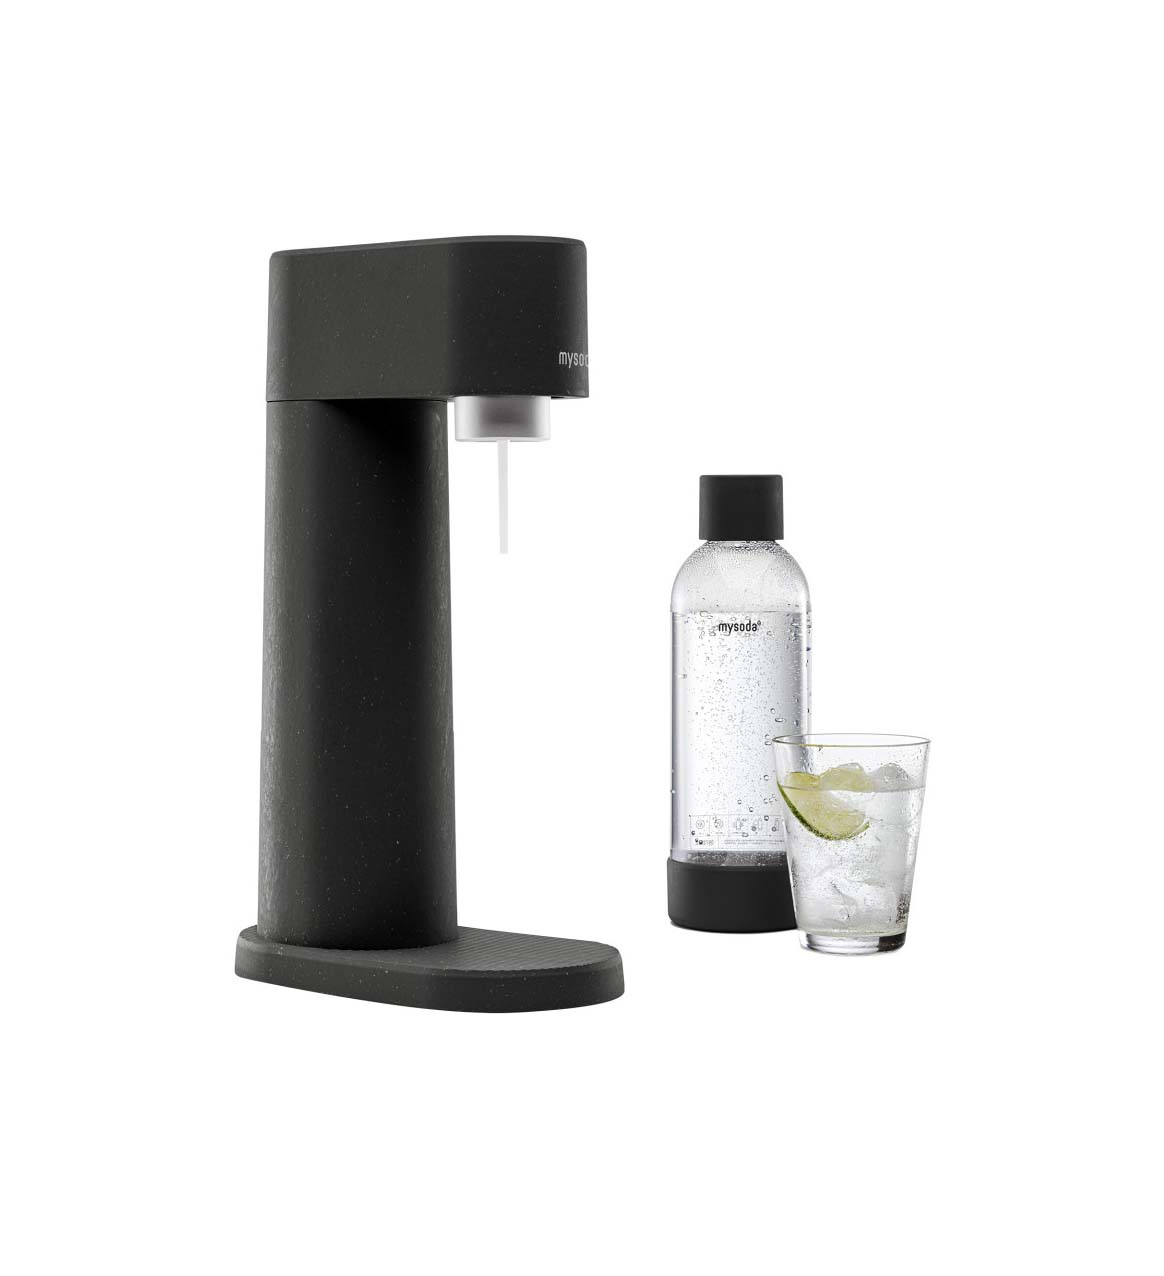 Mysoda Woody Sparkling Water Device